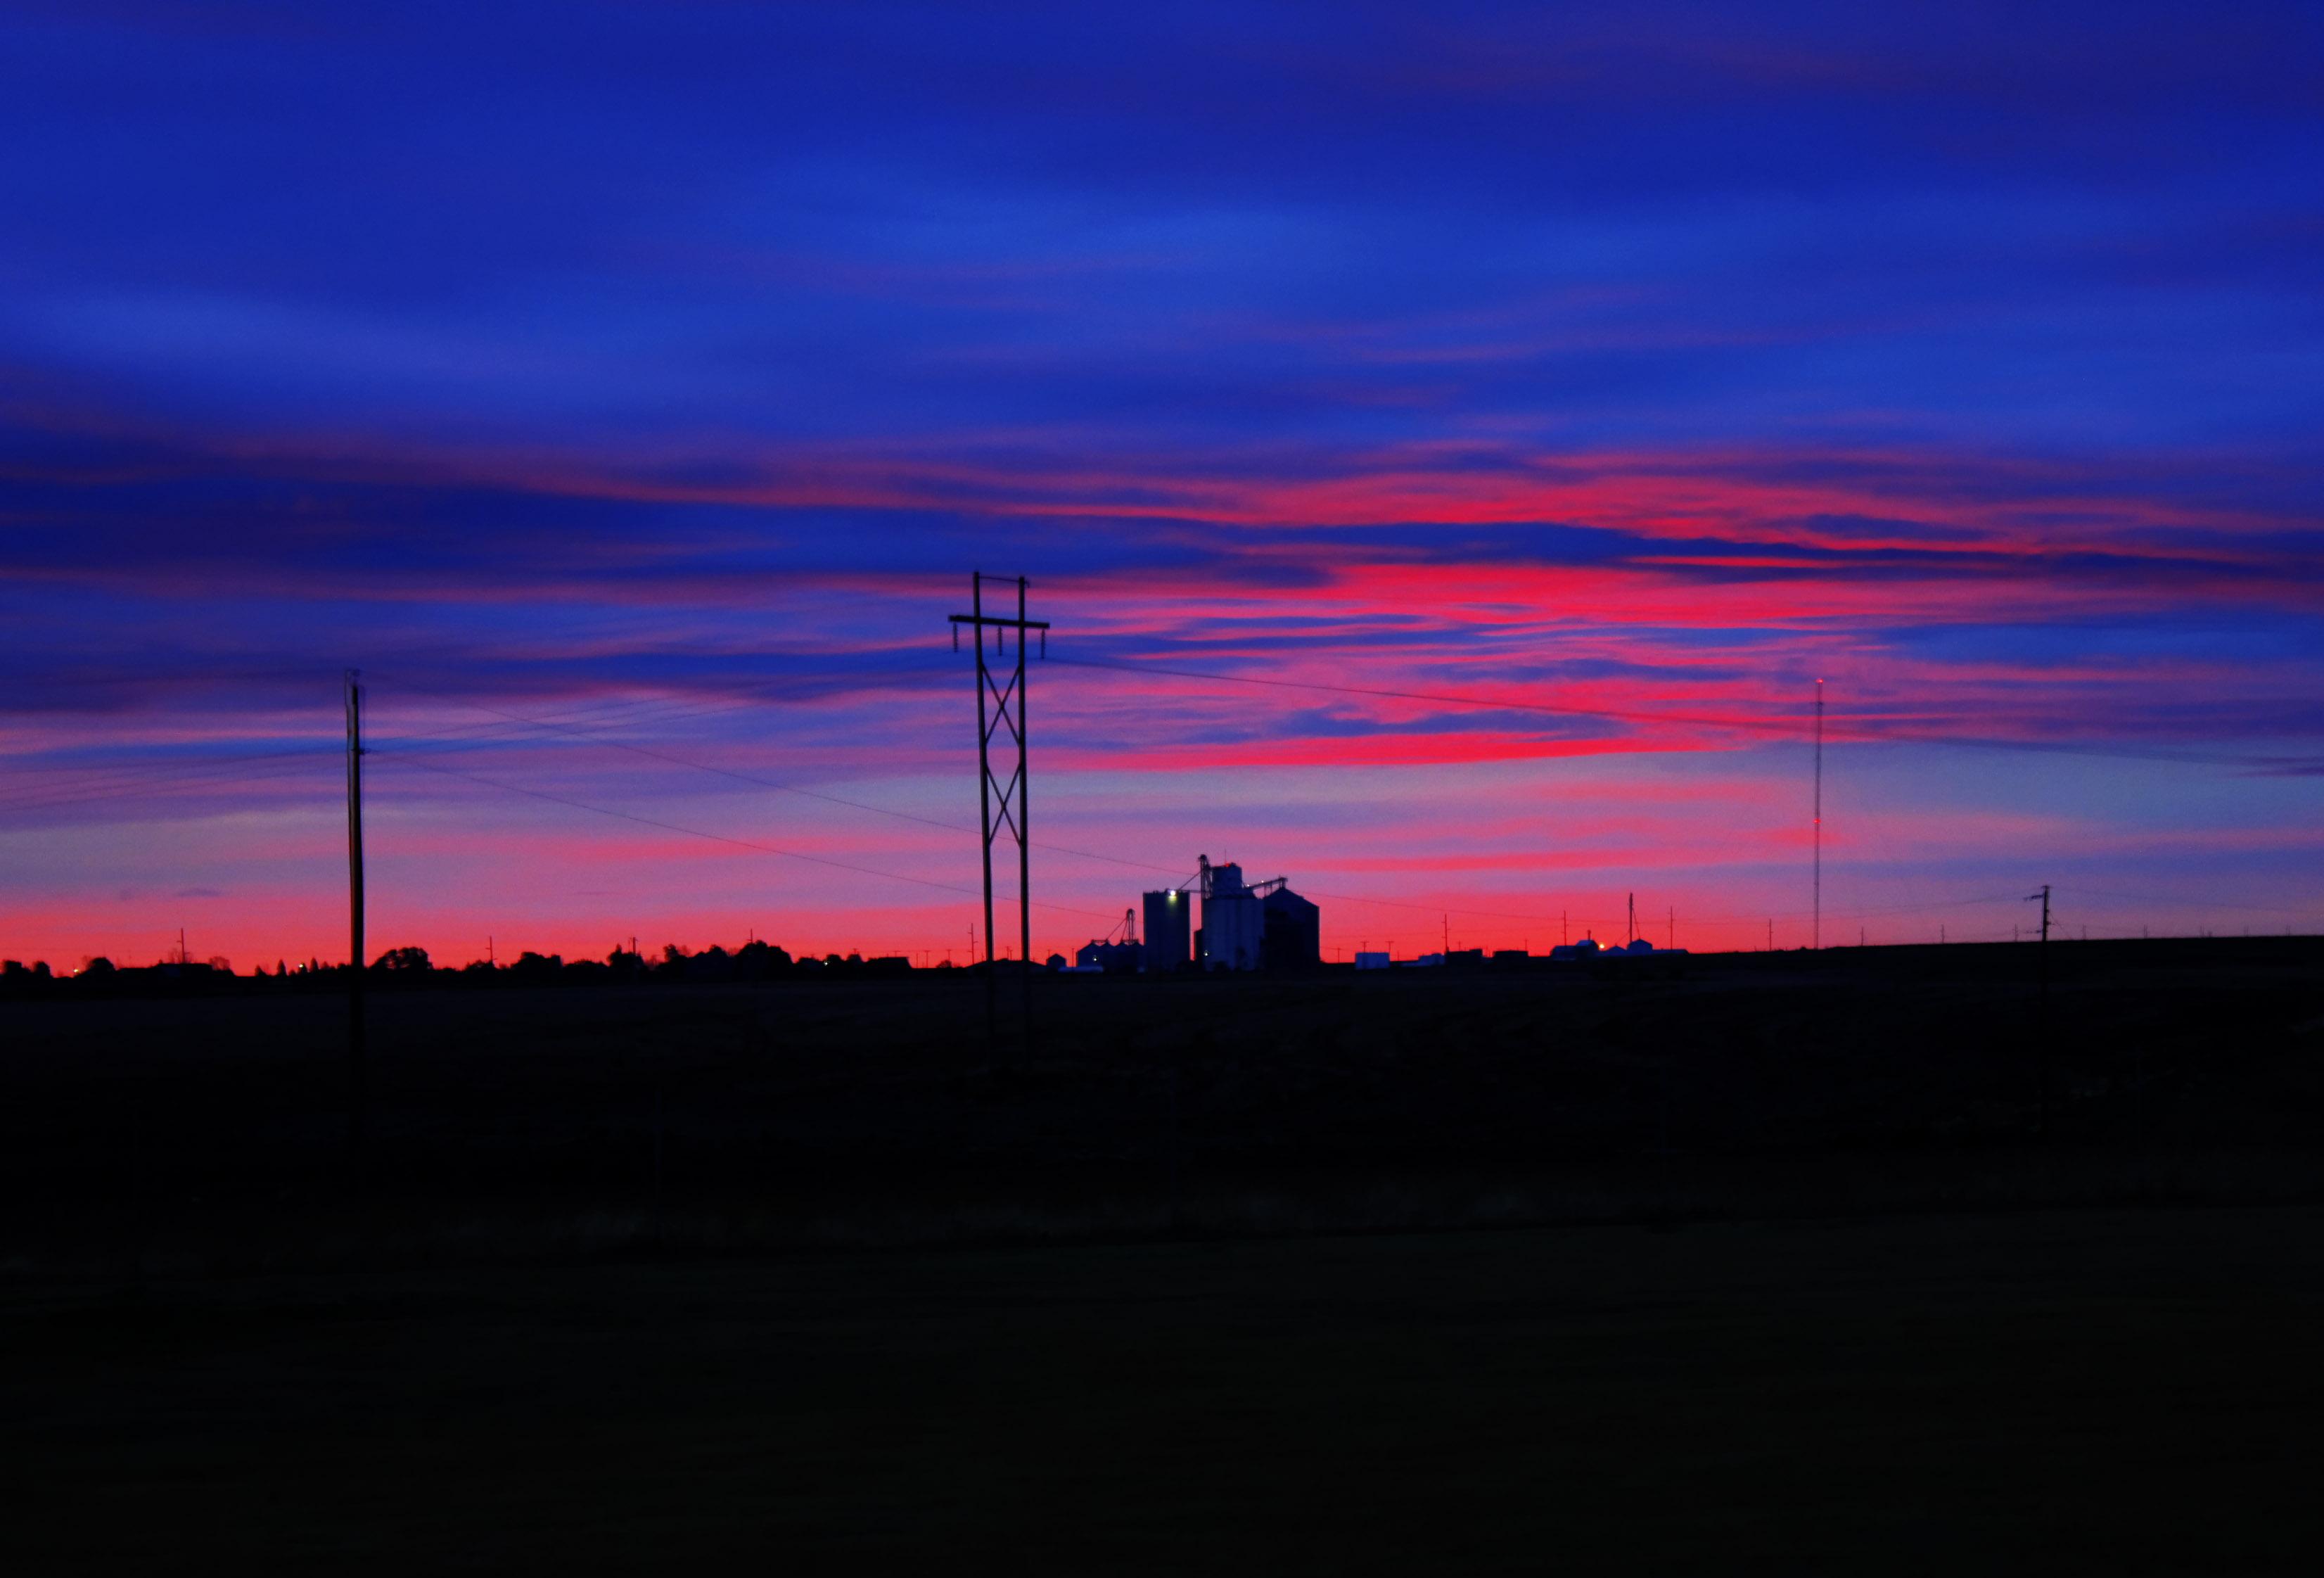 Dawn at the roadside at Mount Sunflower, Kansas image